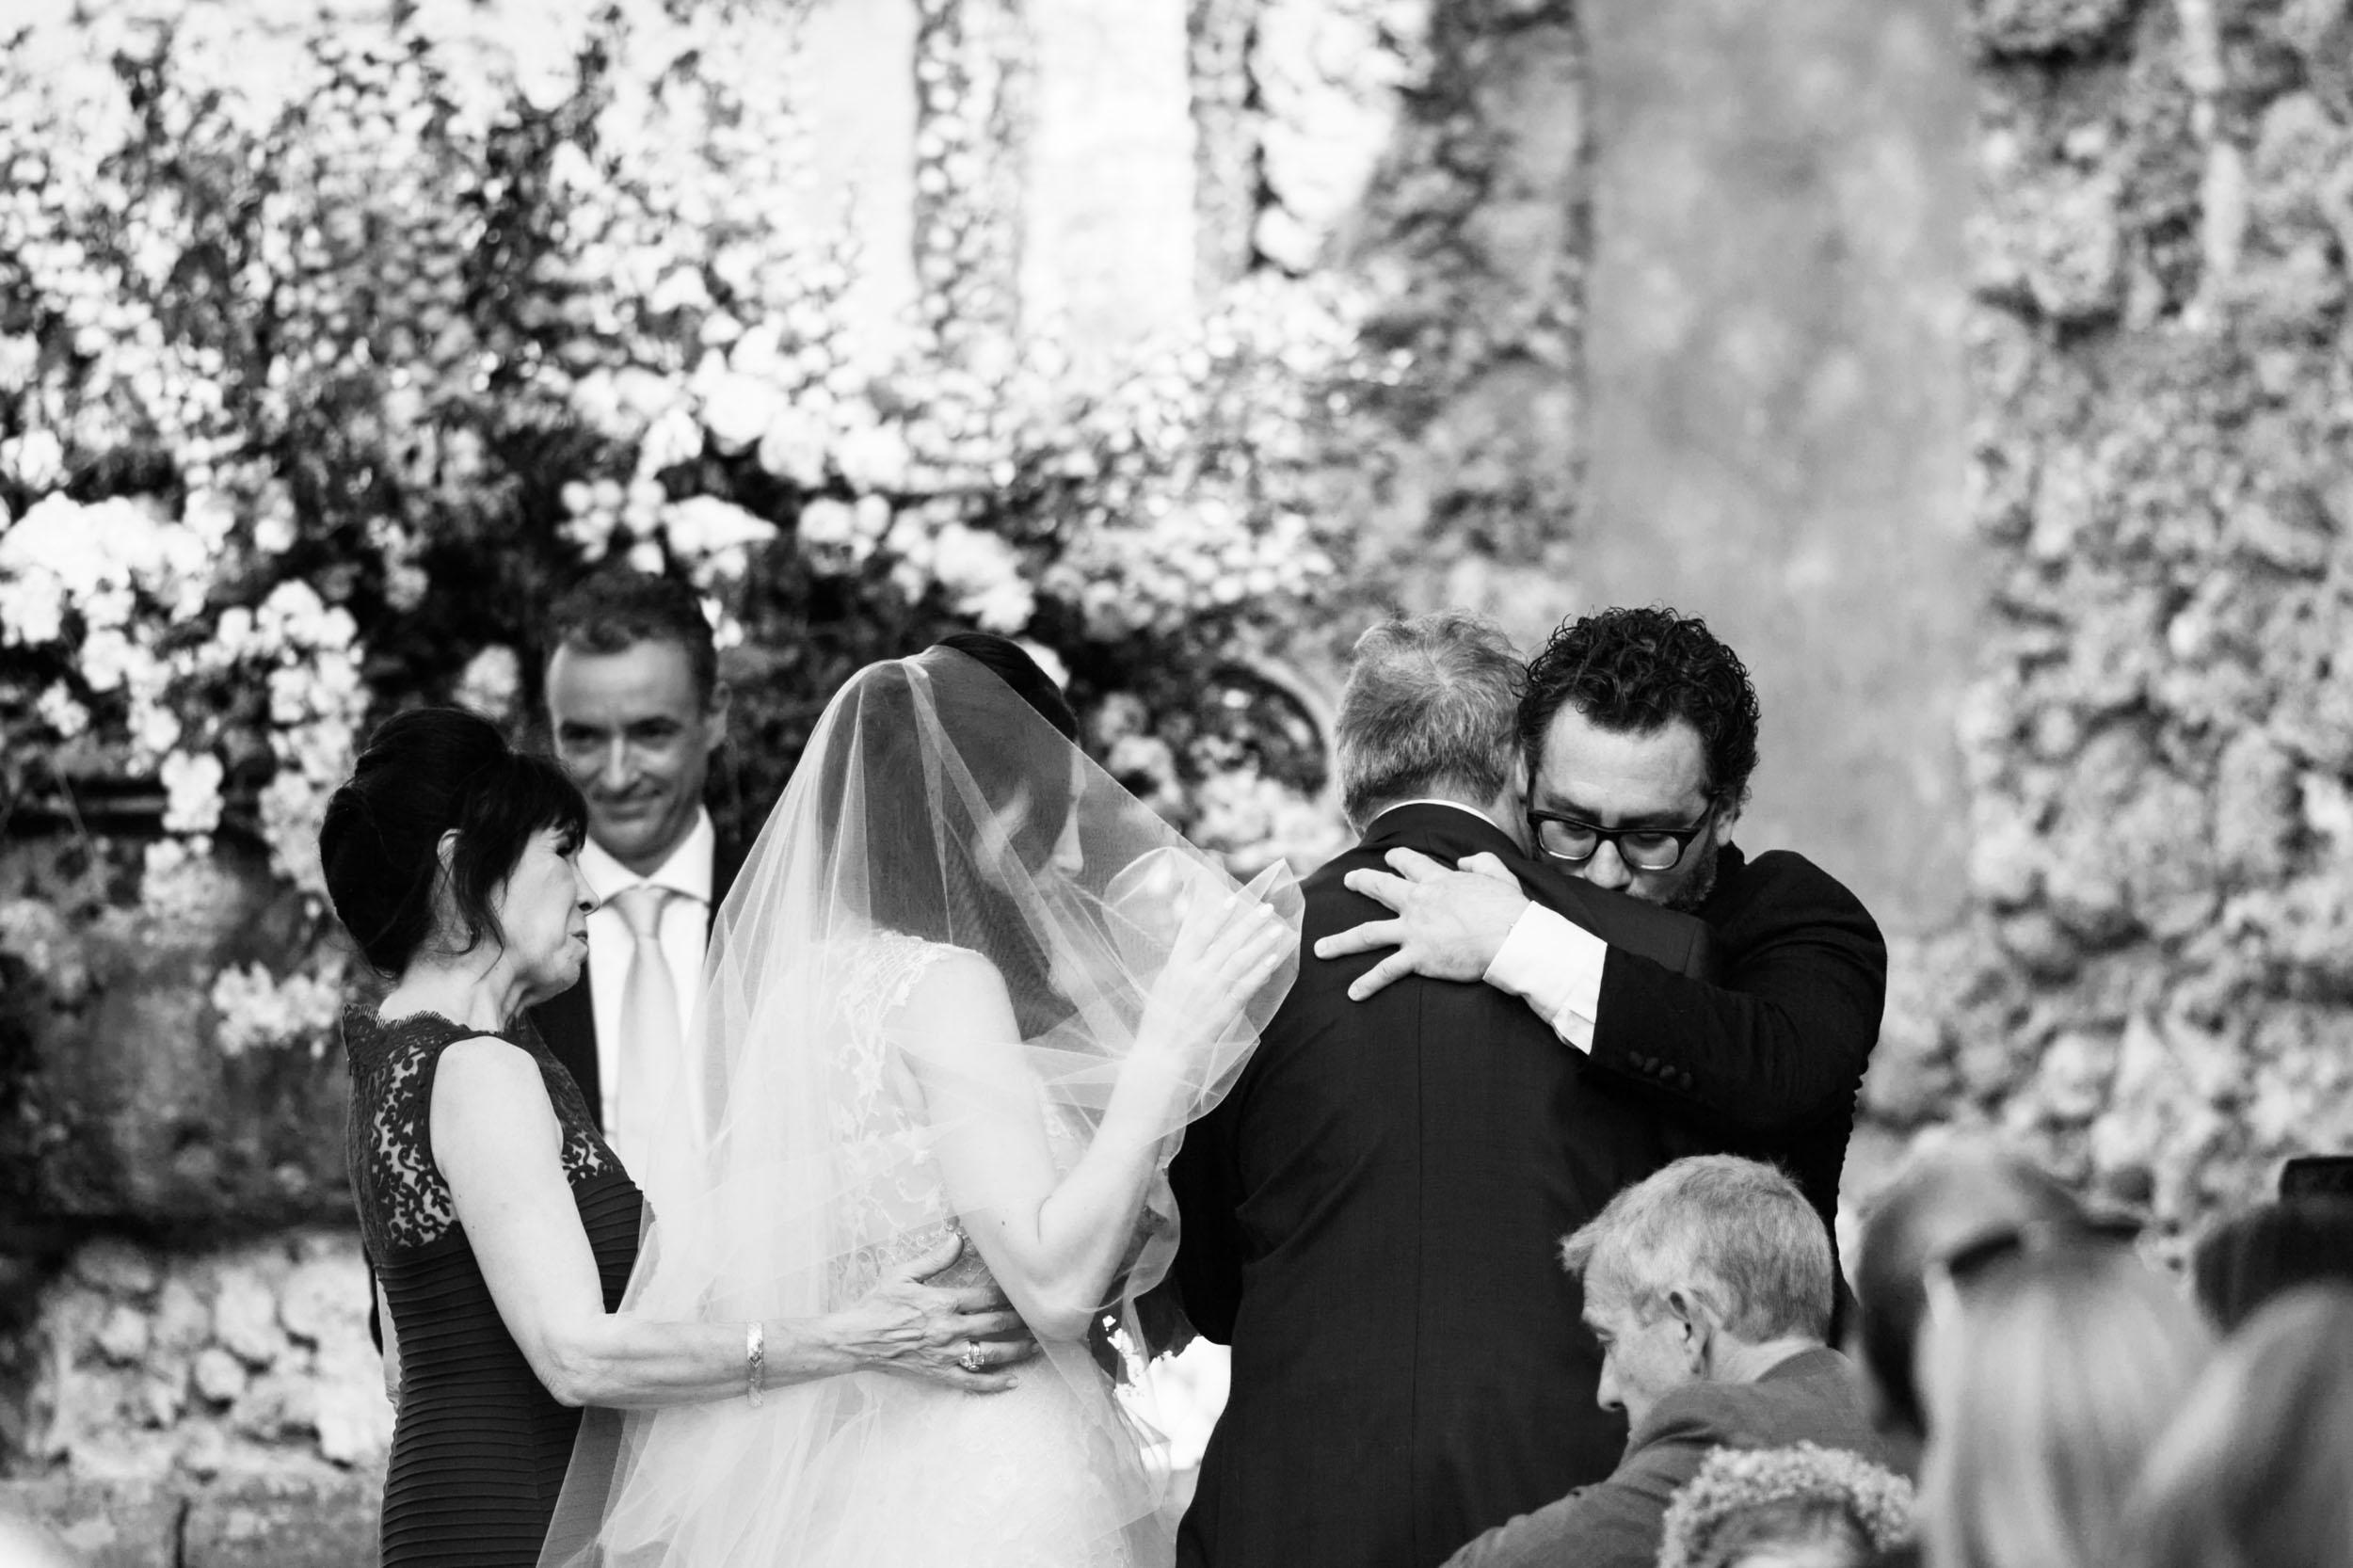 villa-gamberaia-florence-italy-destination-wedding-44.jpg